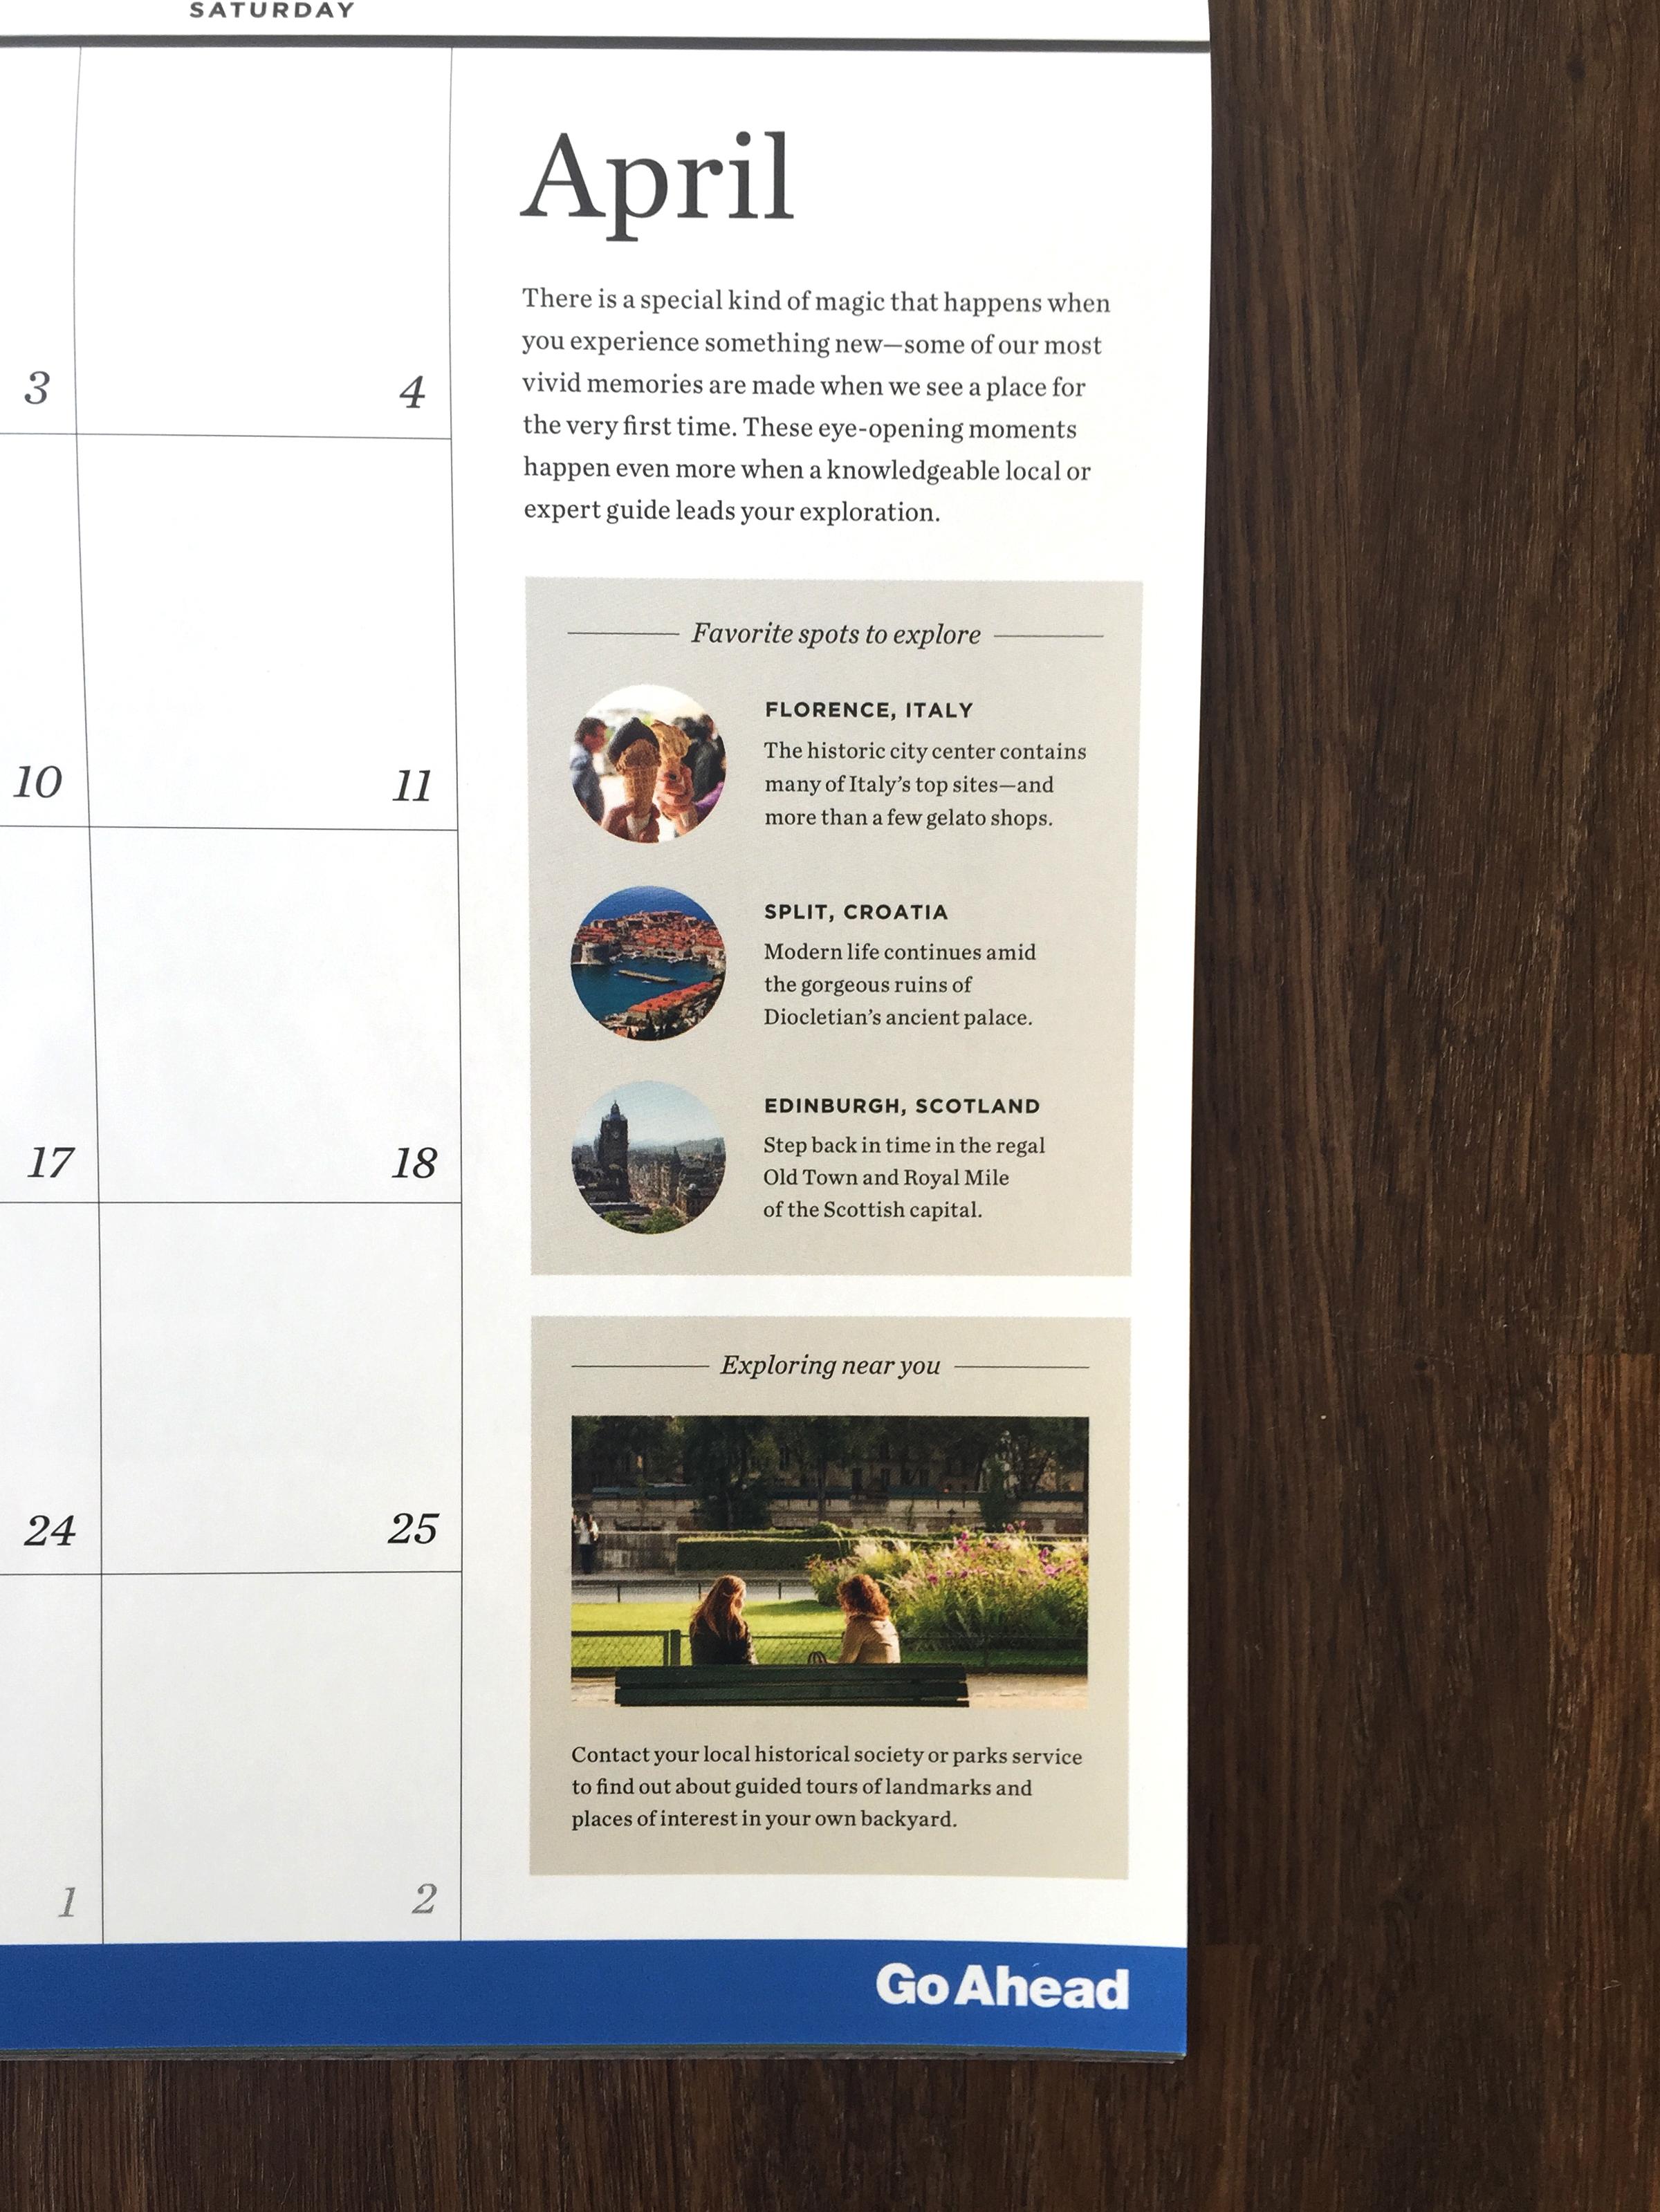 Calendar_April closeup.jpg